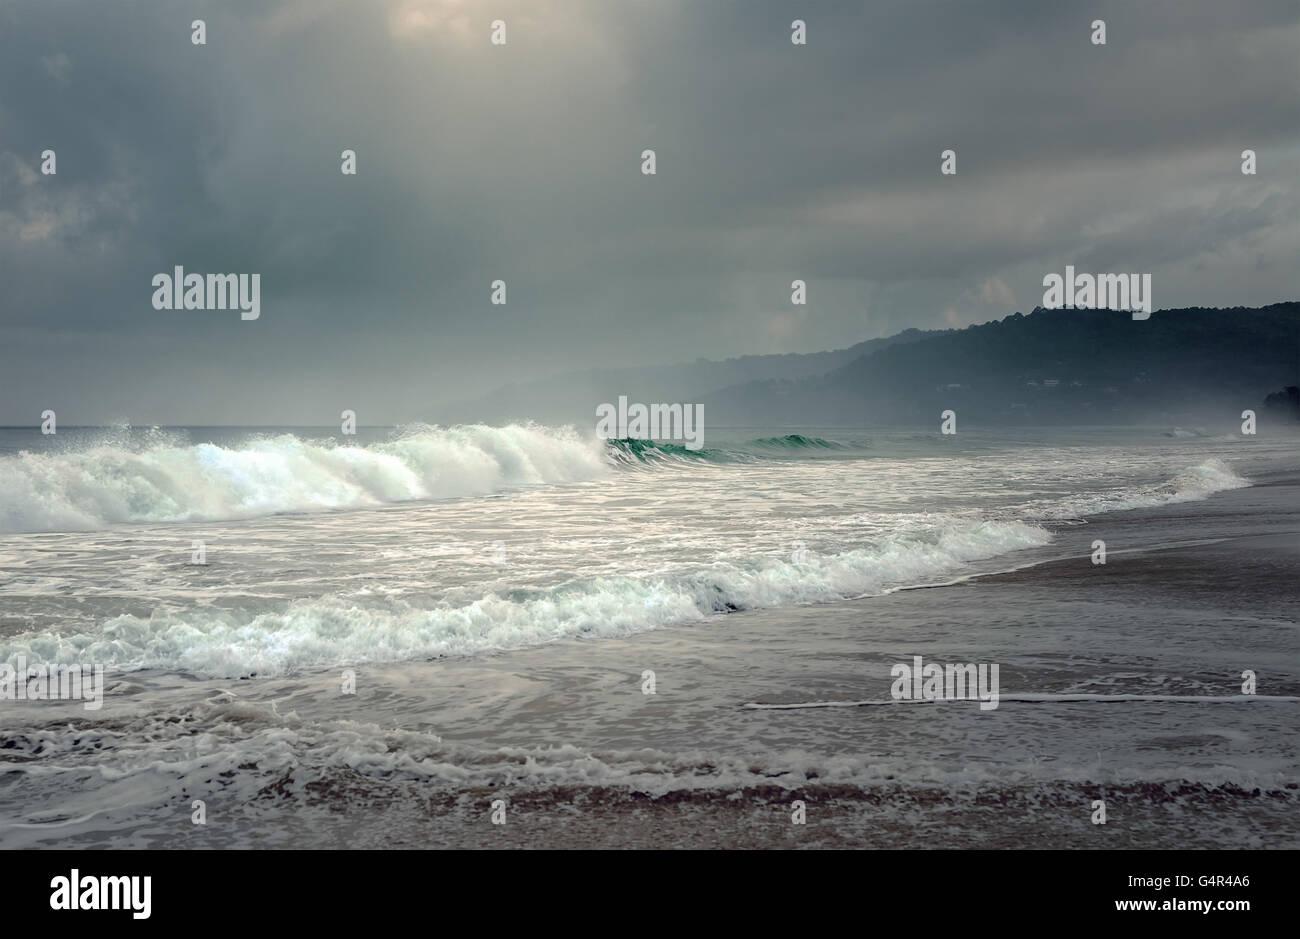 La tormenta tropical de la isla de Phuket en Tailandia Foto de stock